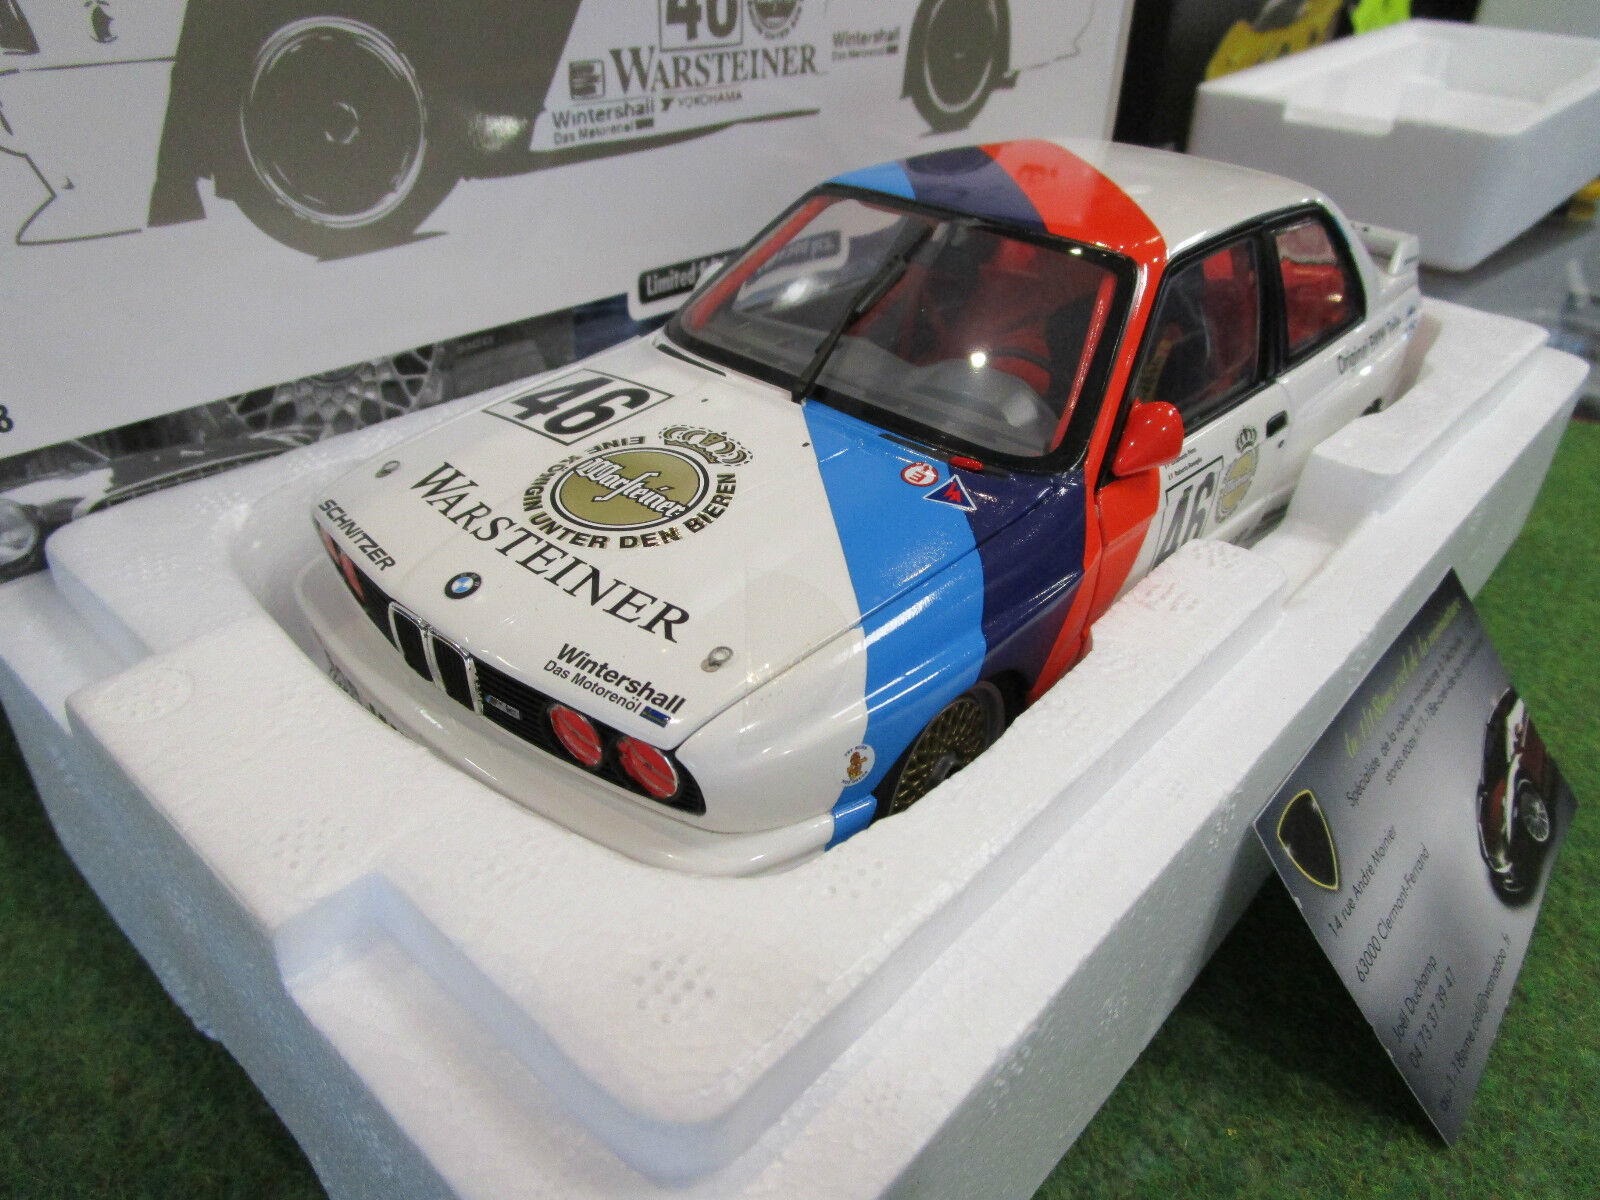 BMW M3 Class Winner CALDER WTC 1987 RAVAGLIA echelle 1 18 d MINICHAMPS 180872046